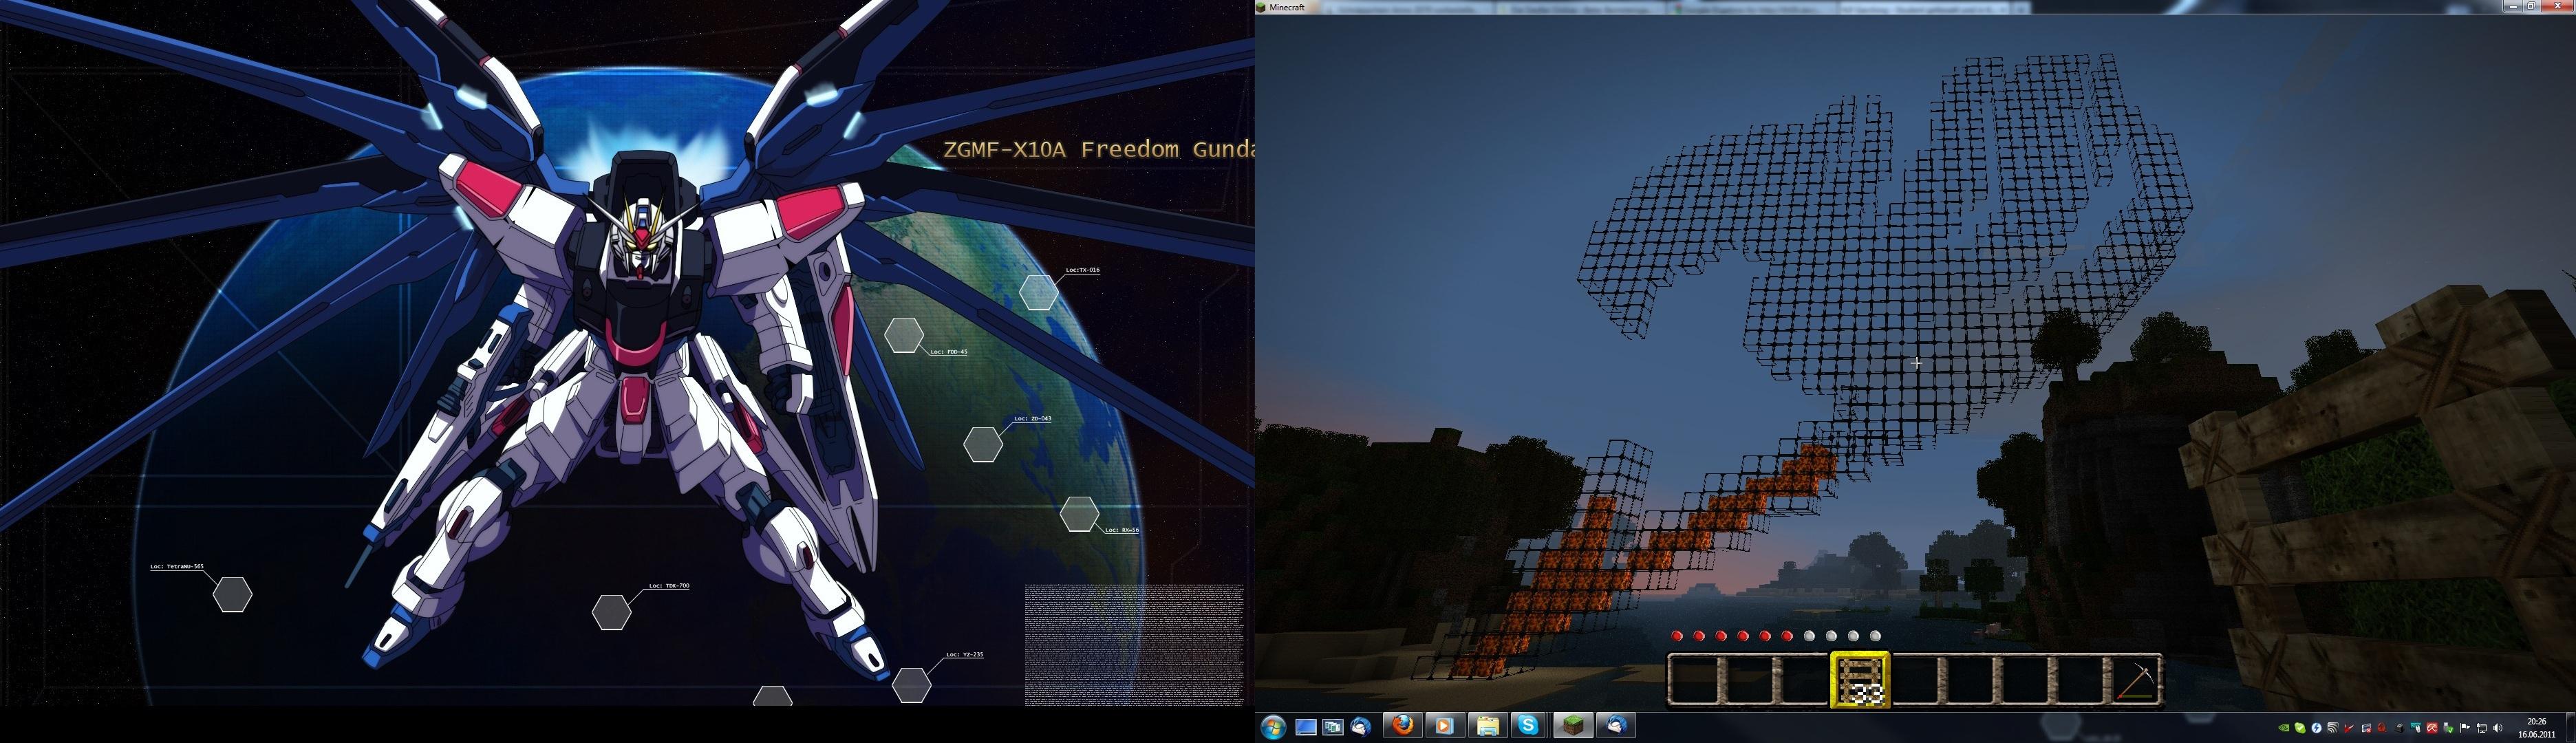 Fairy Tail_under_construction3.jpg